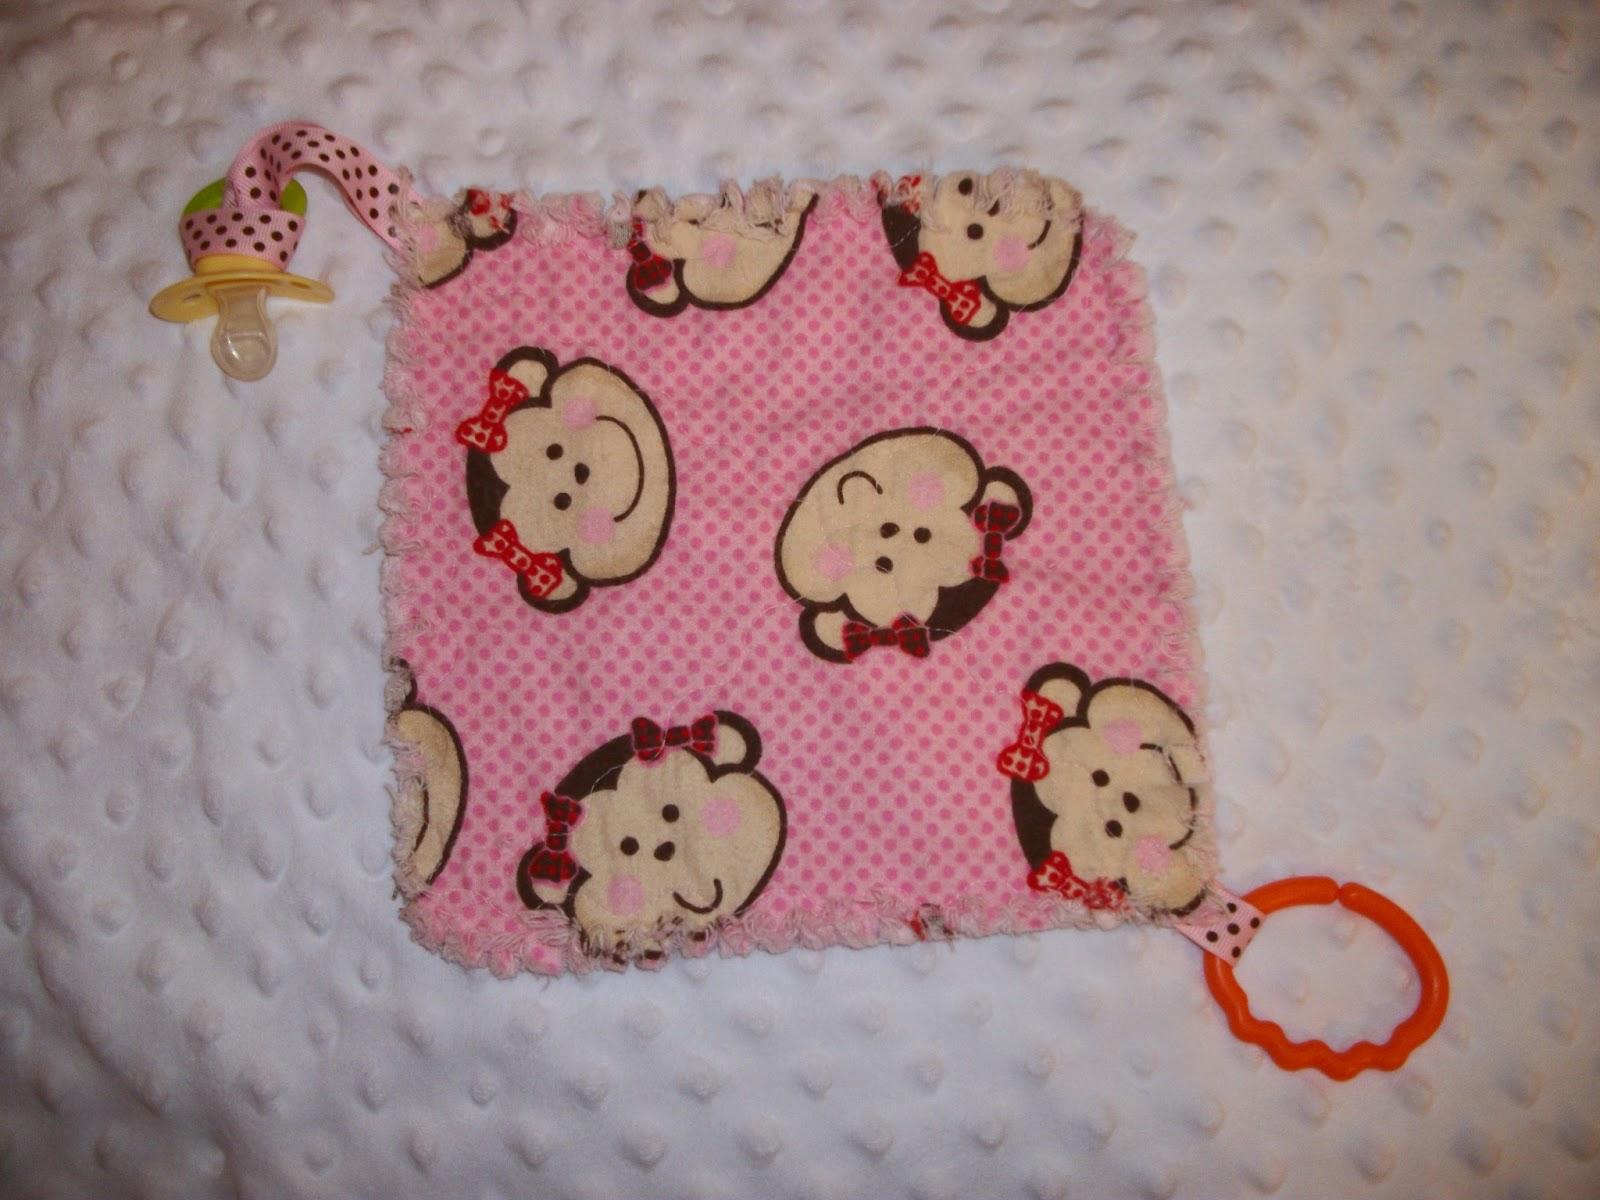 Deerecountry Quilts baby girl monkey burp cloths